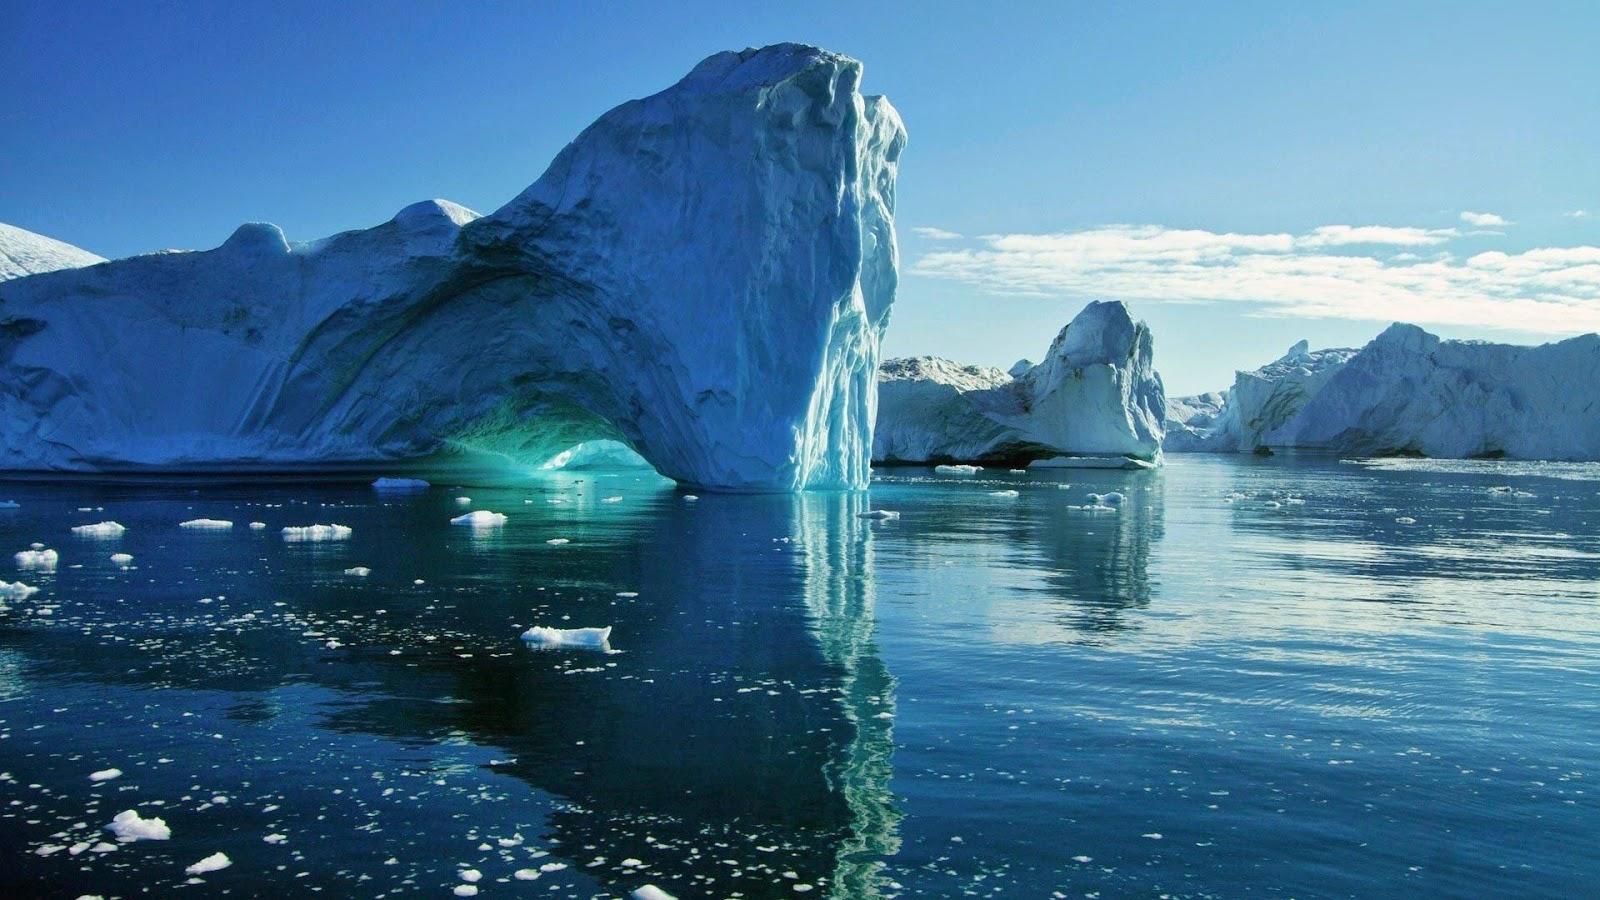 Papel de Parede Natureza Icebergs para pc hd grátis Nature desktop hd wallpaper image free